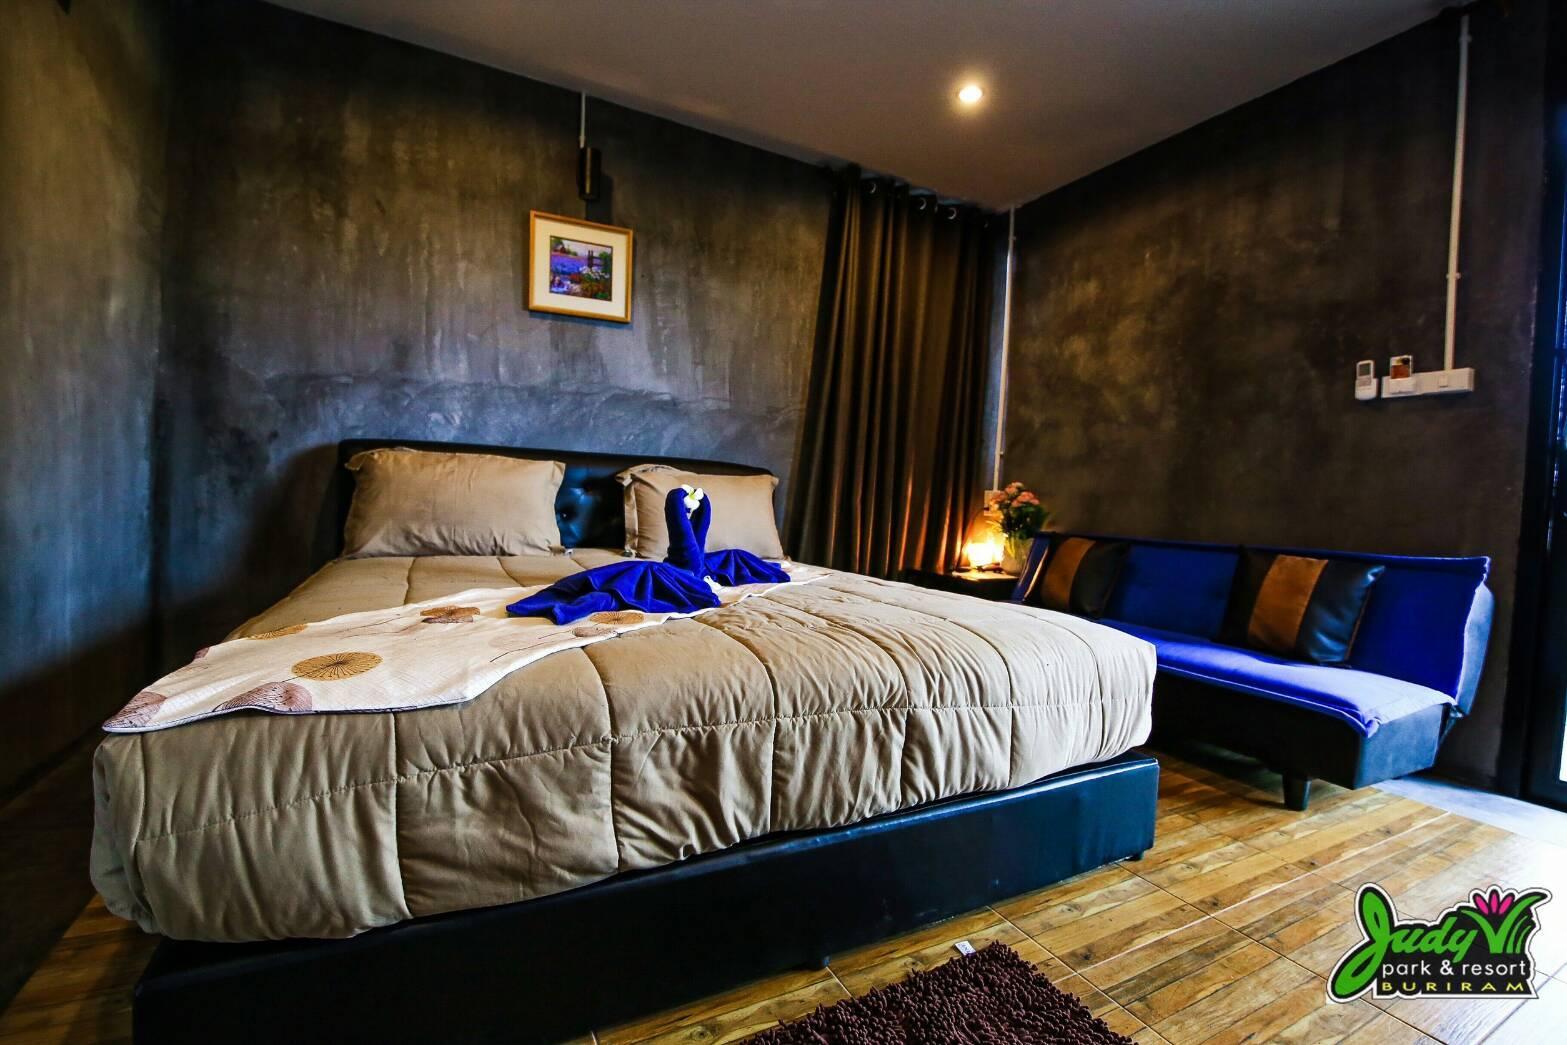 Buriram Judy Park And Resort